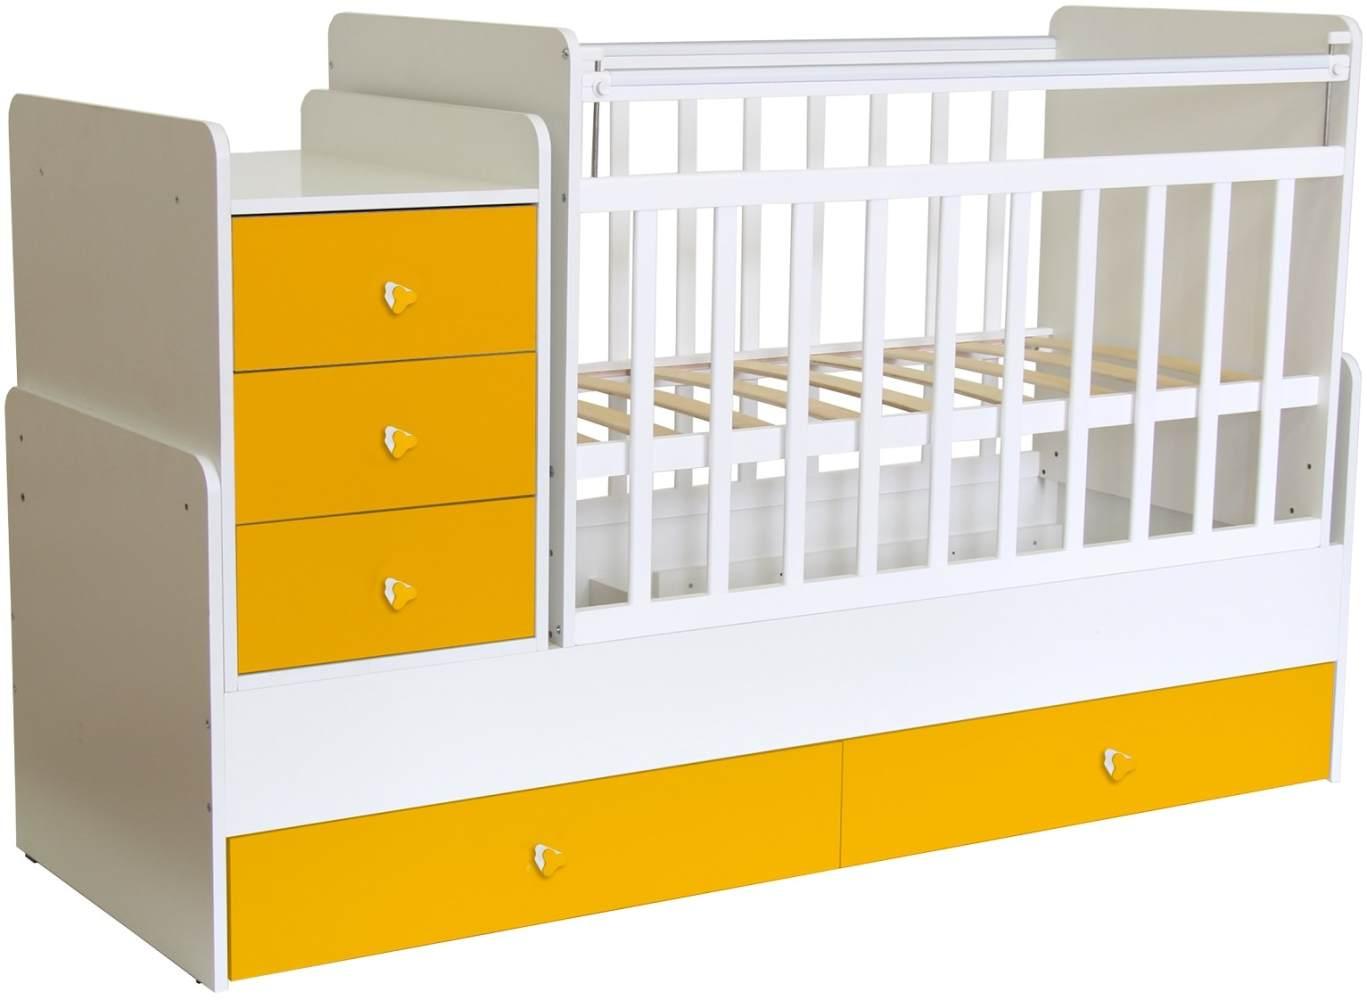 Polini Kids 'Simple 1100' Kombi-Kinderbett 60 x 120/170 cm, weiß/gelb, höhenverstellbar, mit Schaukelfunktion, inkl. Kommode Bild 1